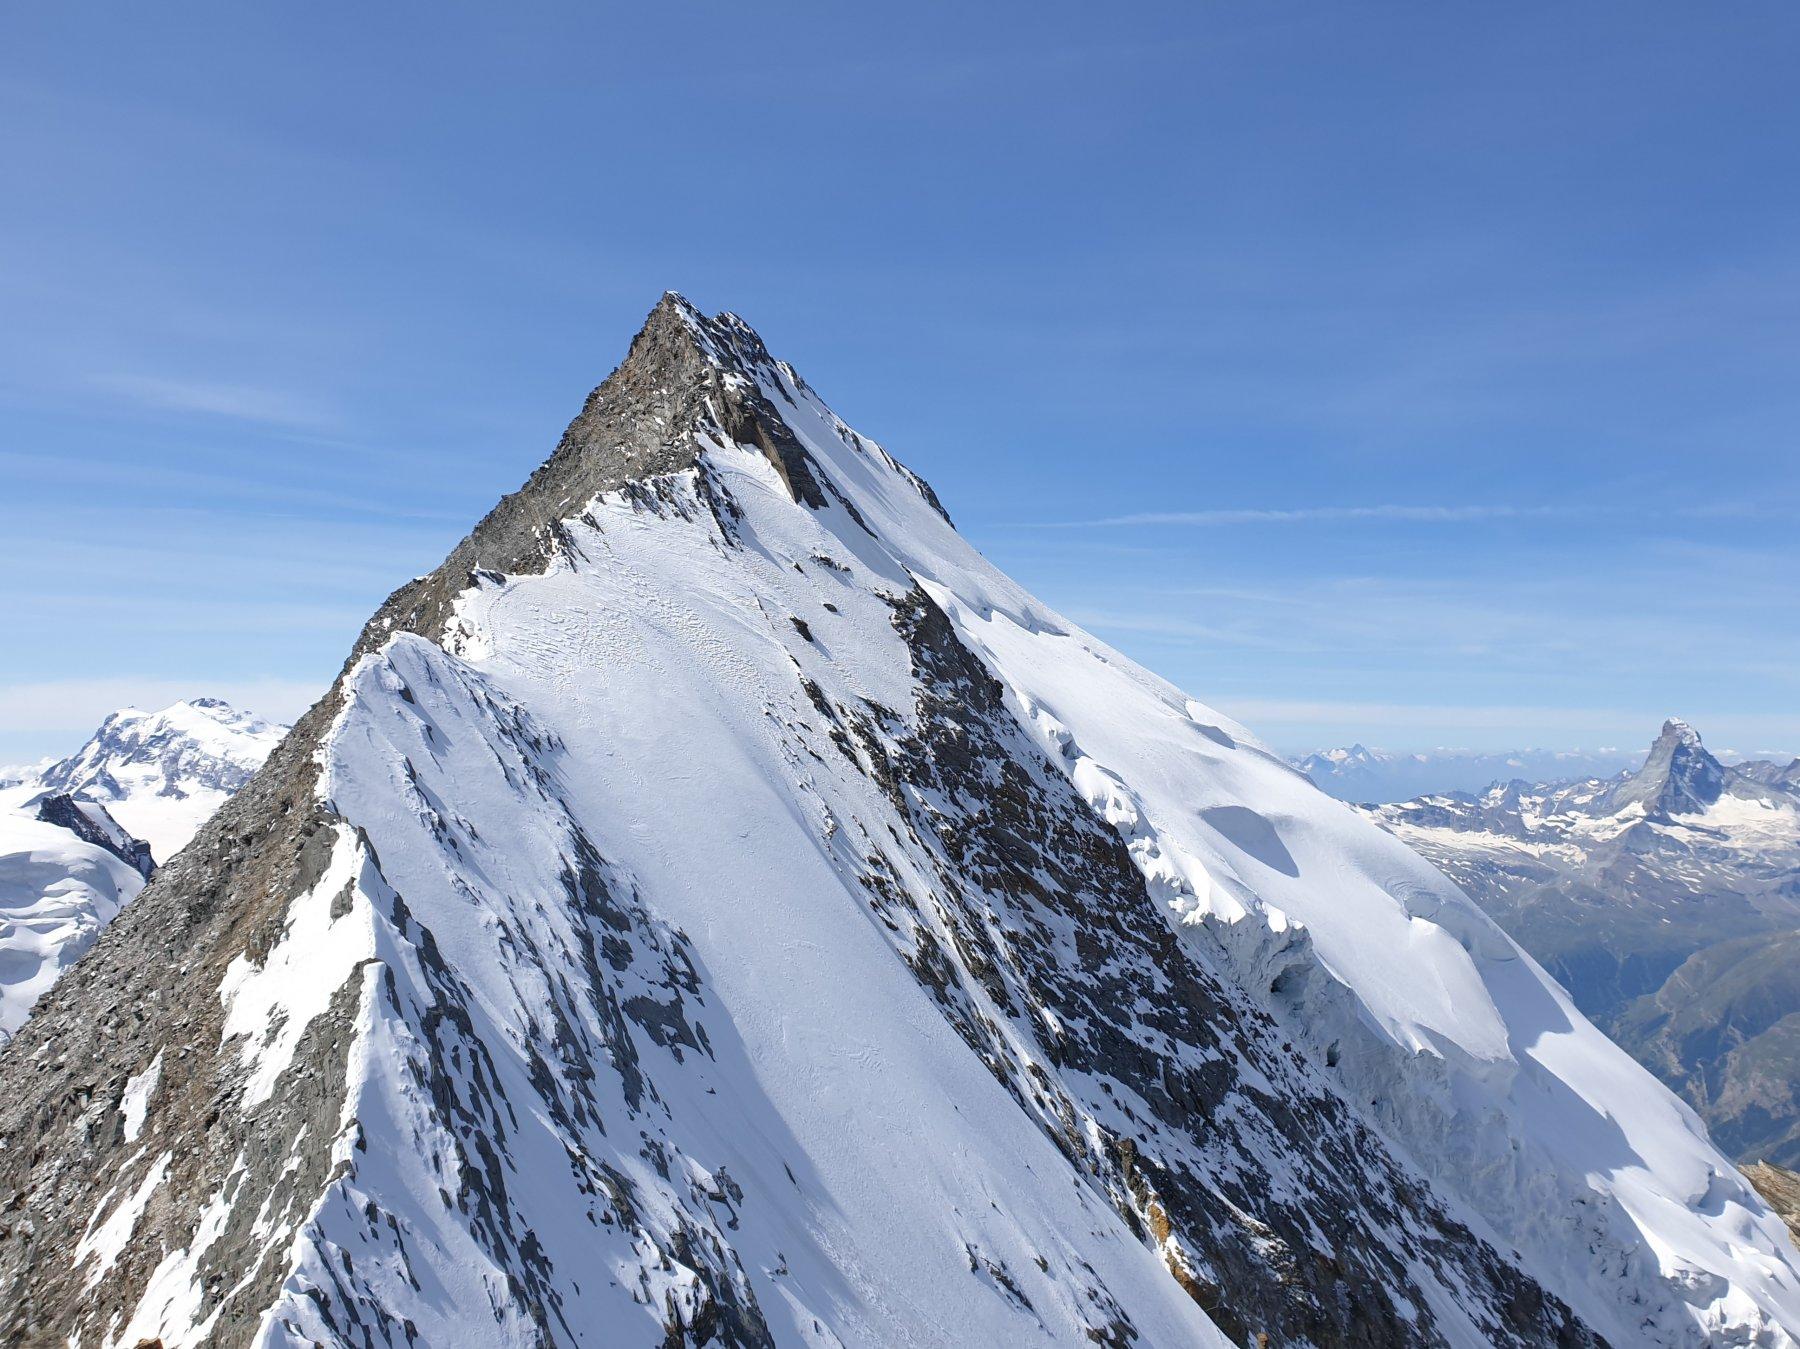 La cresta del Täschhorn appena discesa vista dal Domjoch